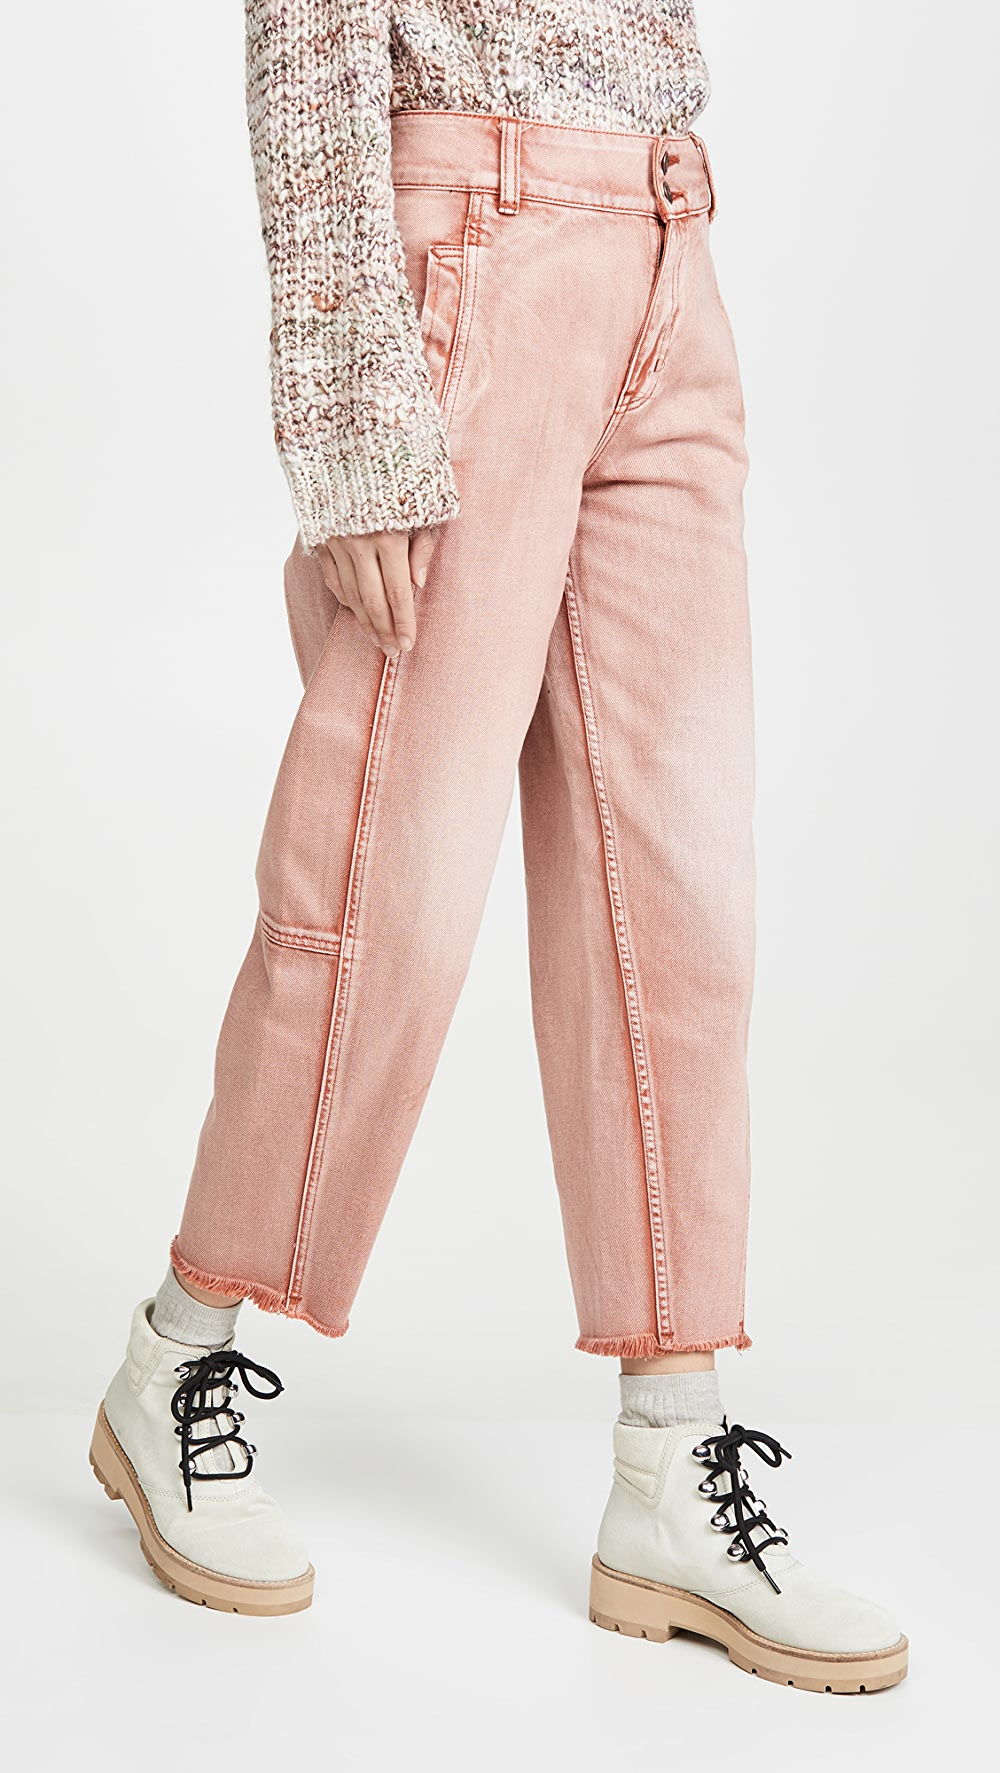 100% True Free People - Monroe Jeans Fragrant (In) Flavor